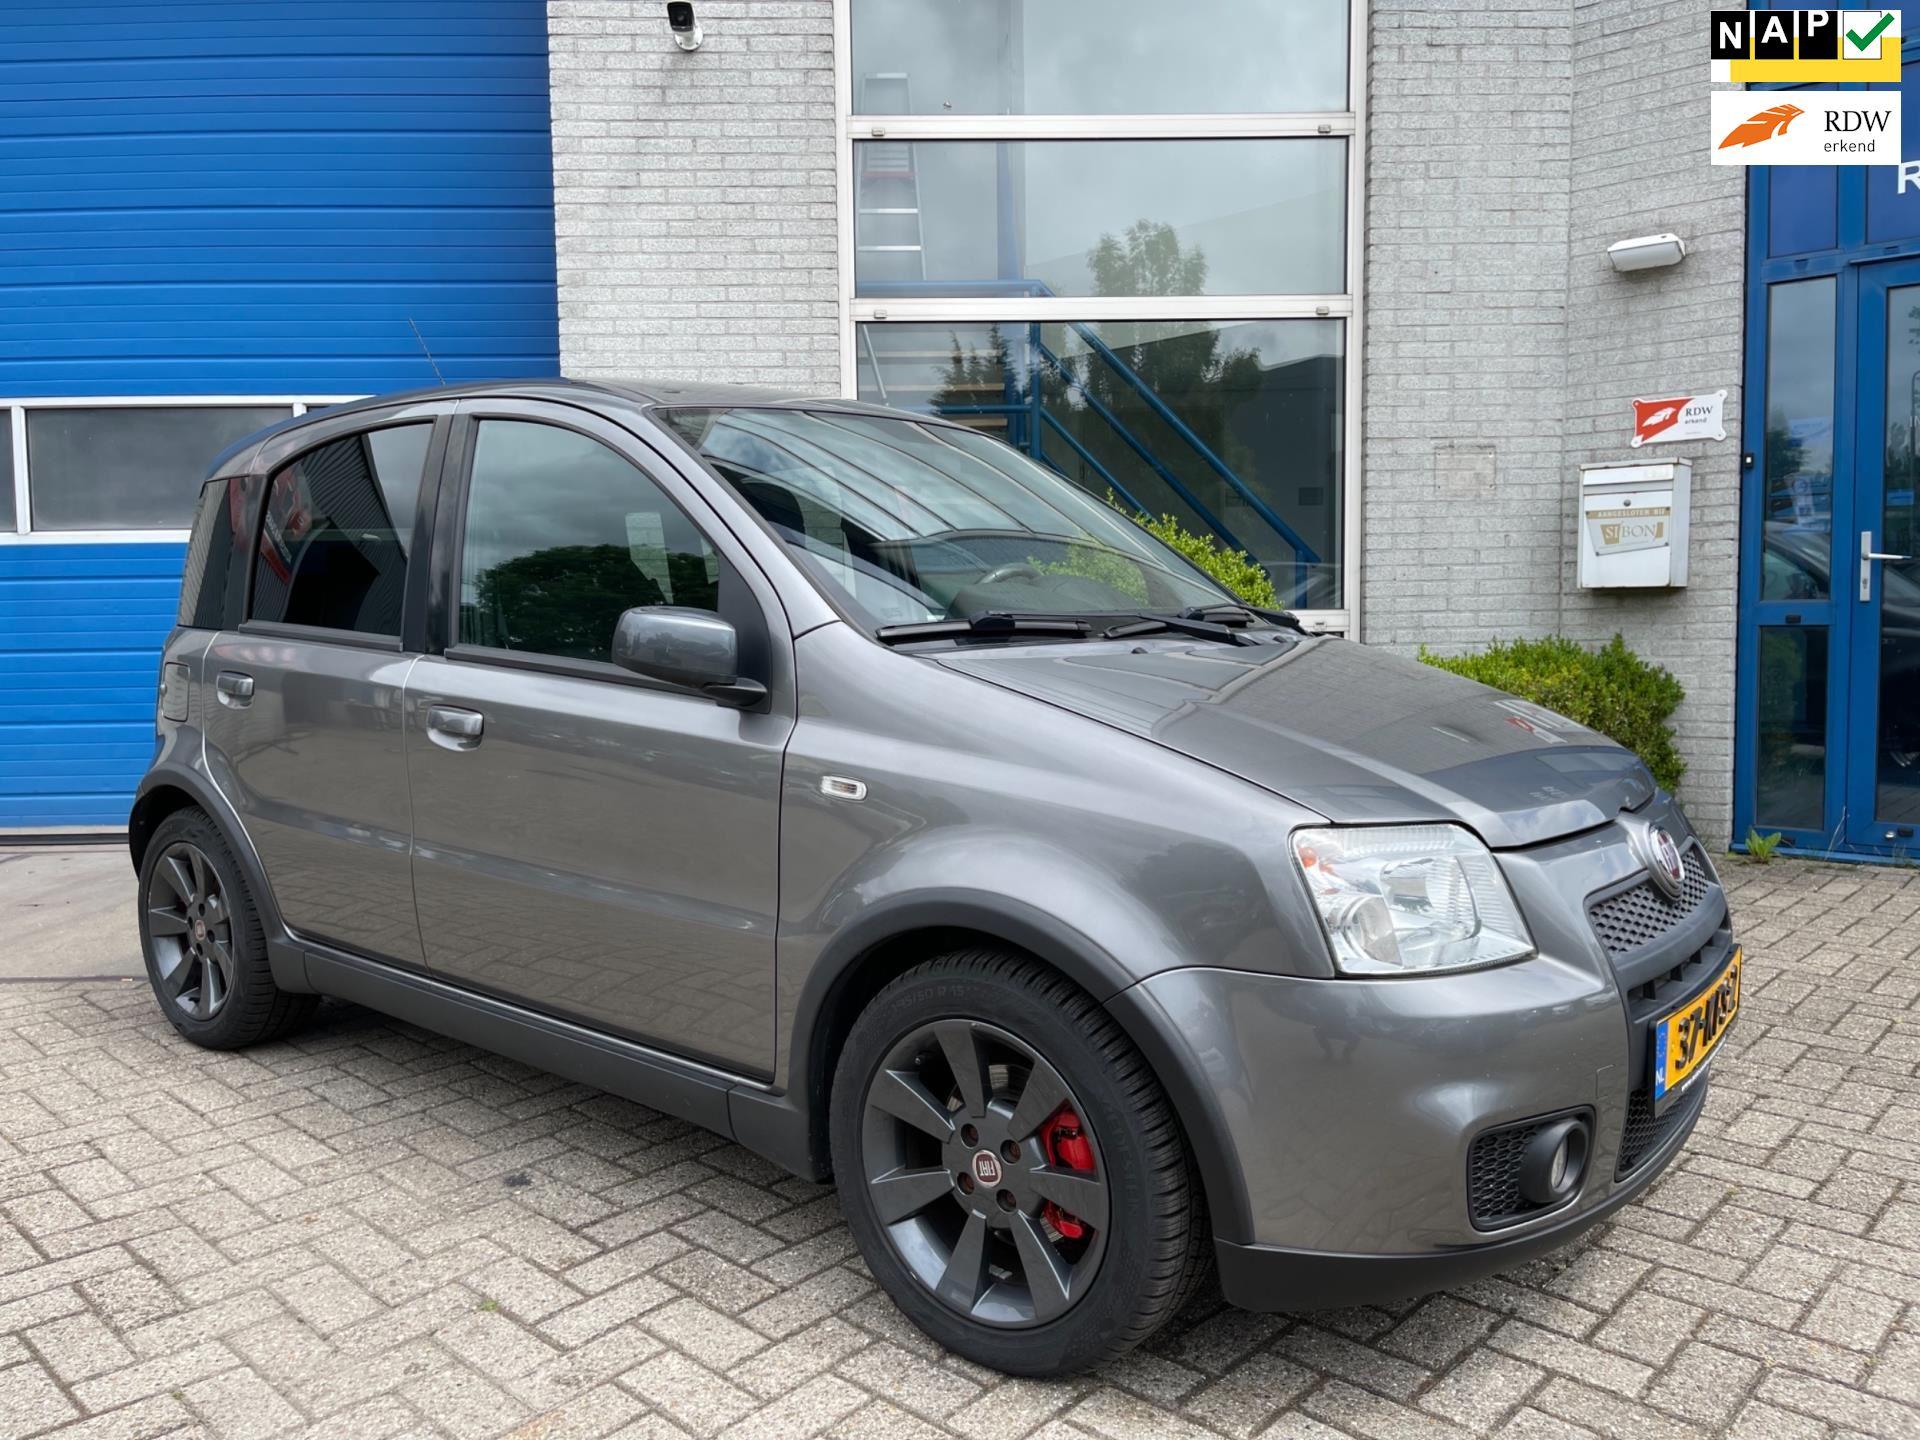 Fiat Panda occasion - Autocentrum Zaanstad